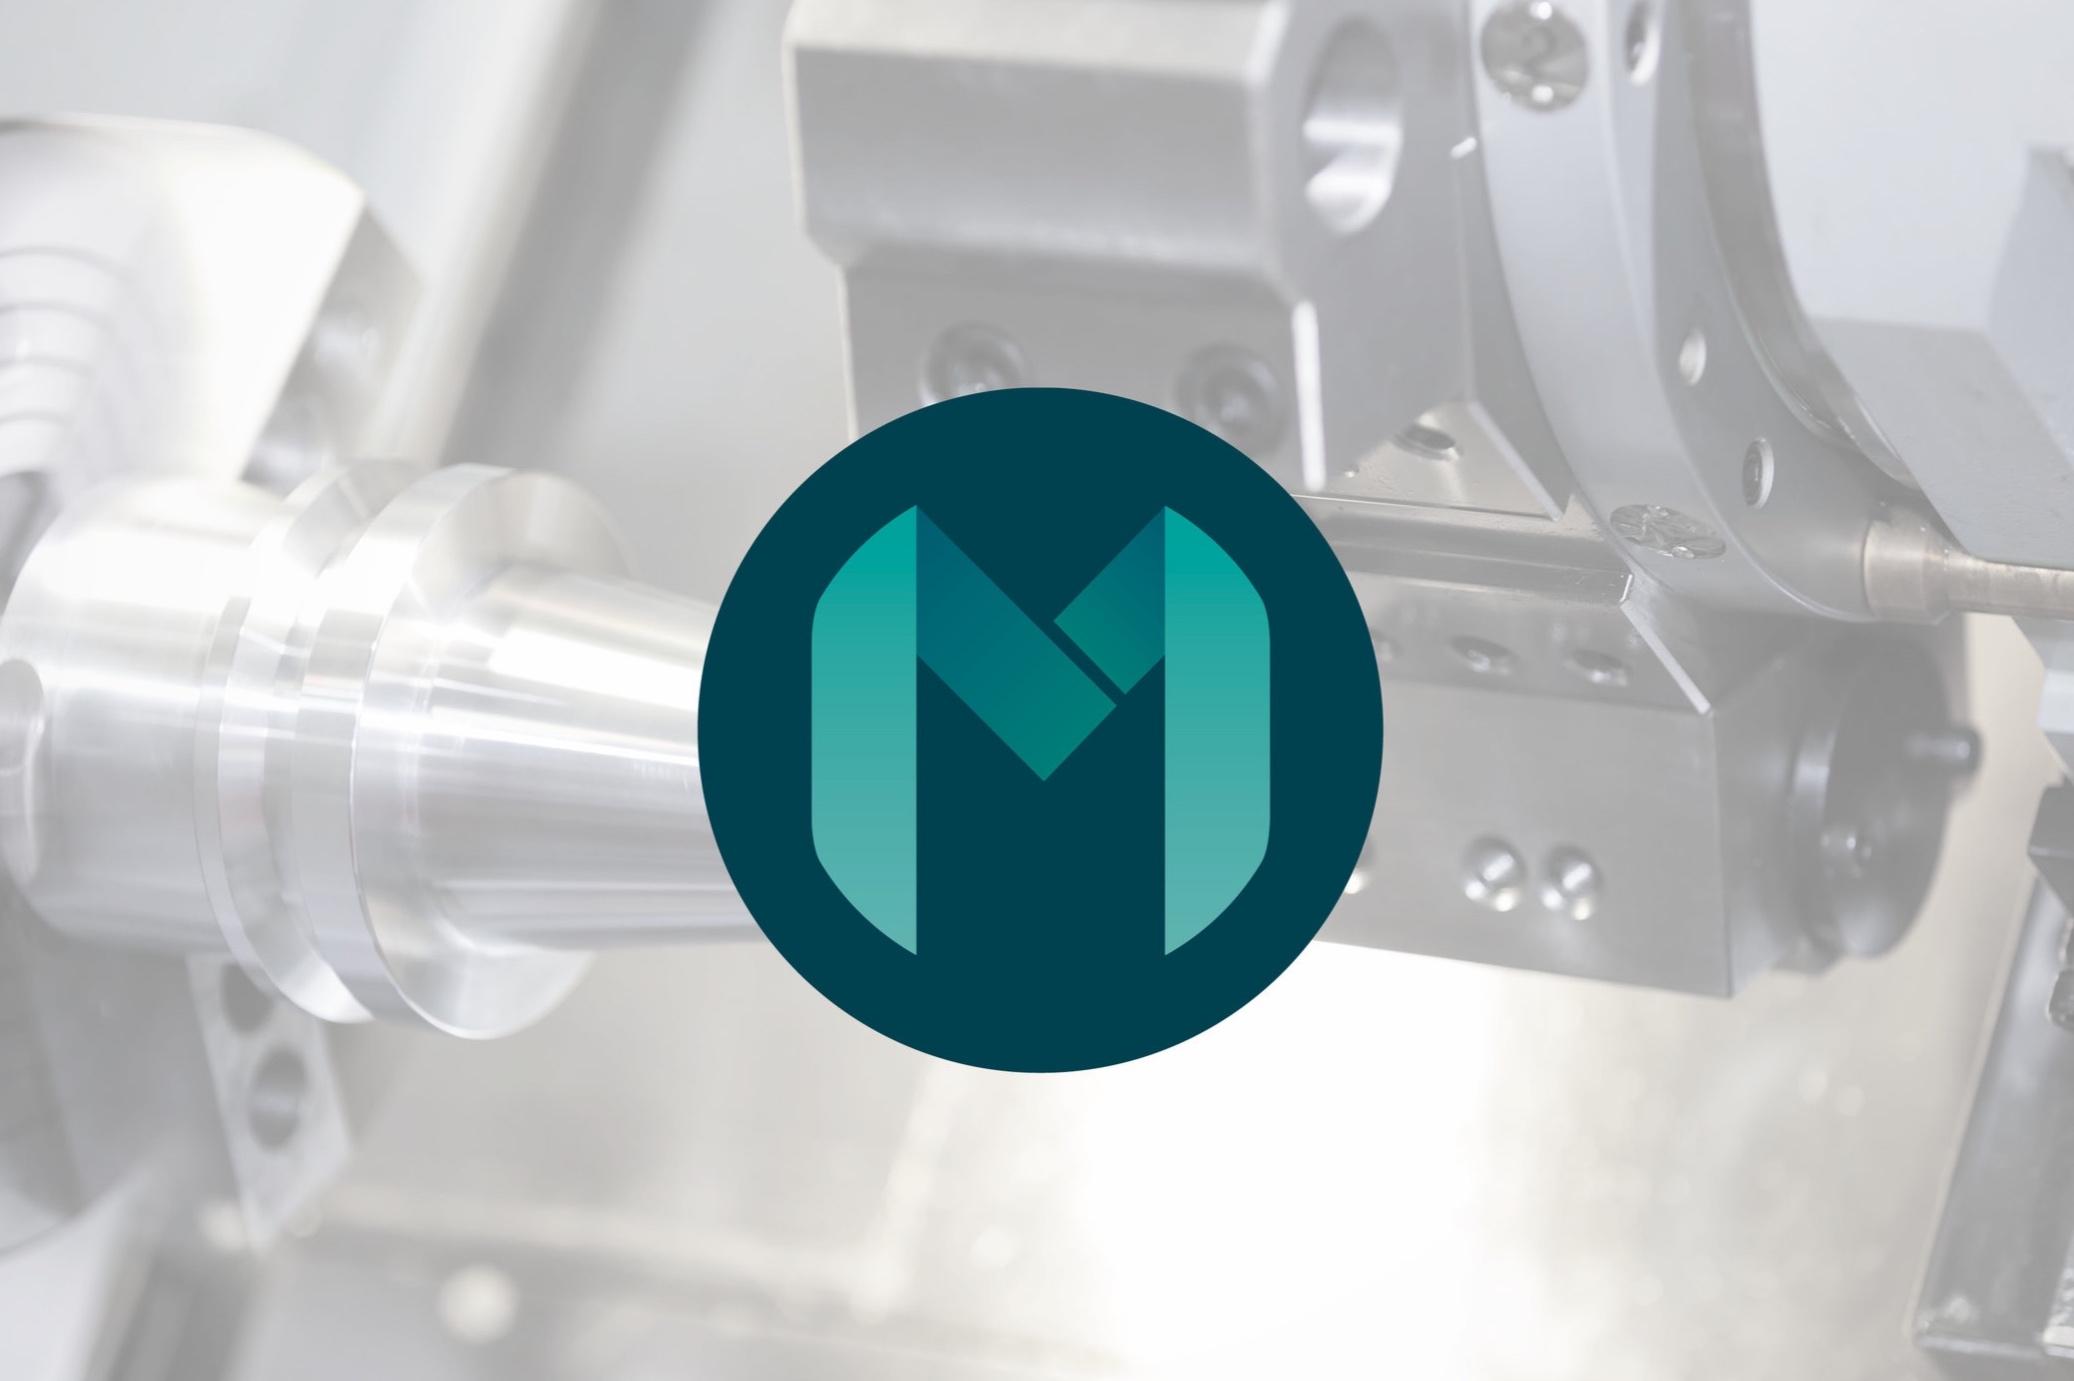 Logo_one_machining.jpg